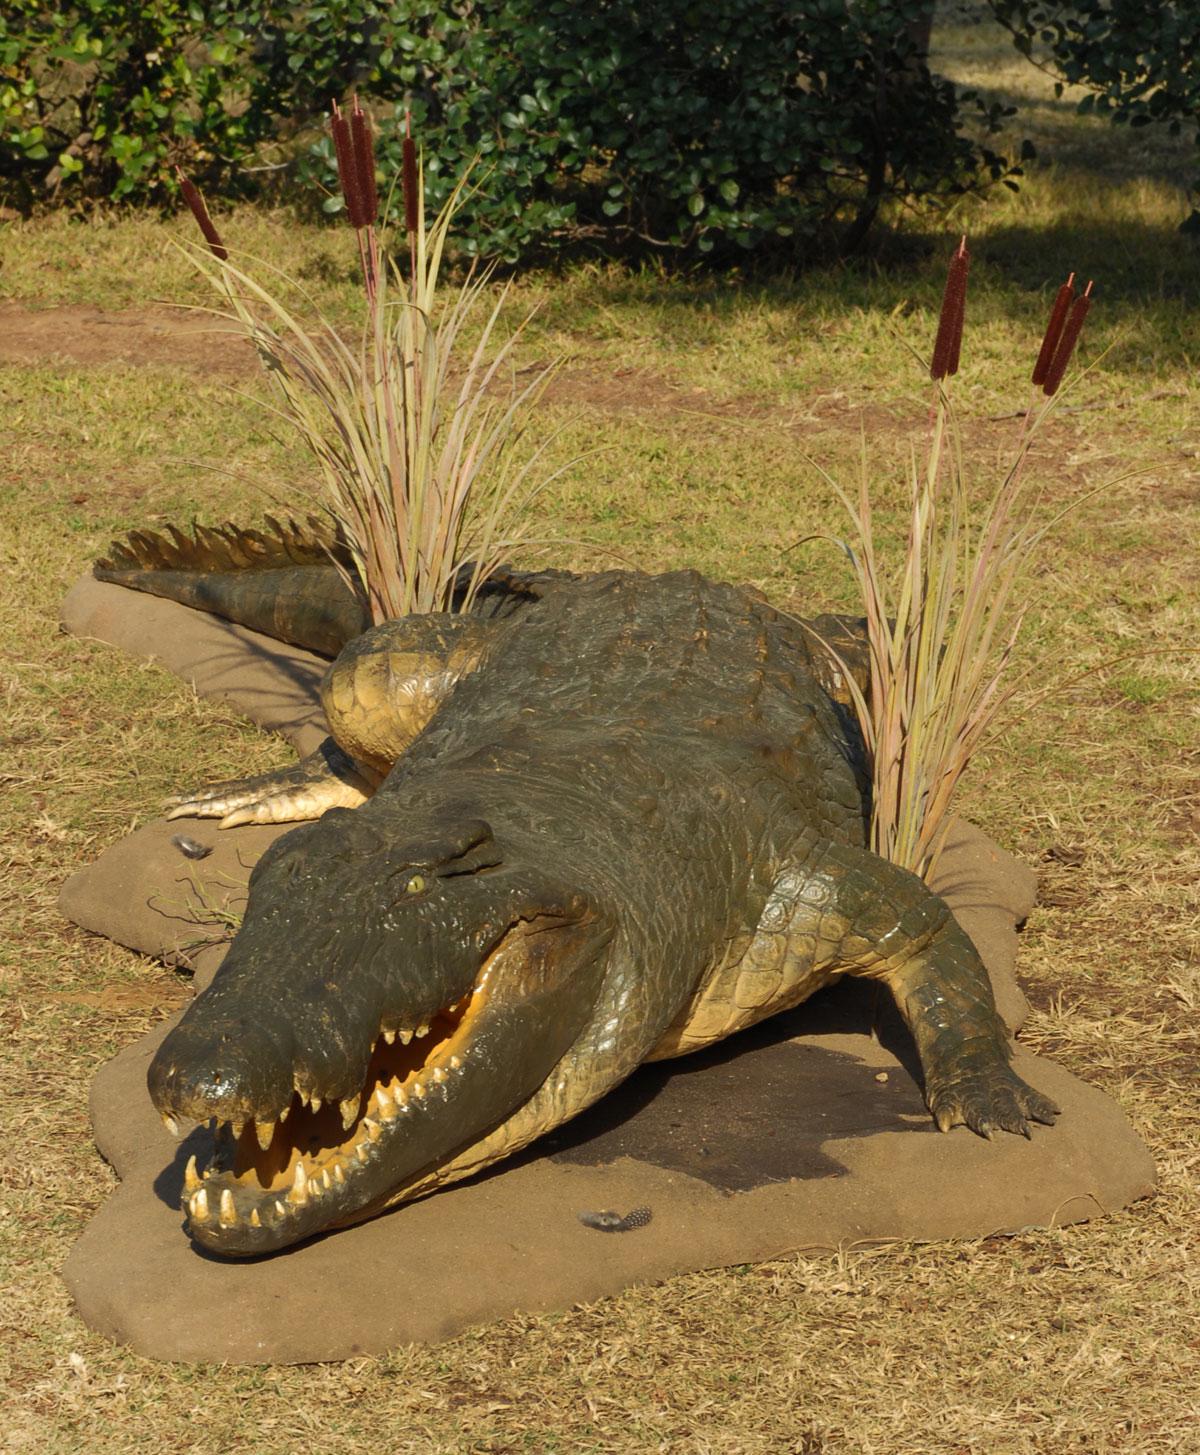 Crocodile_front2.jpg